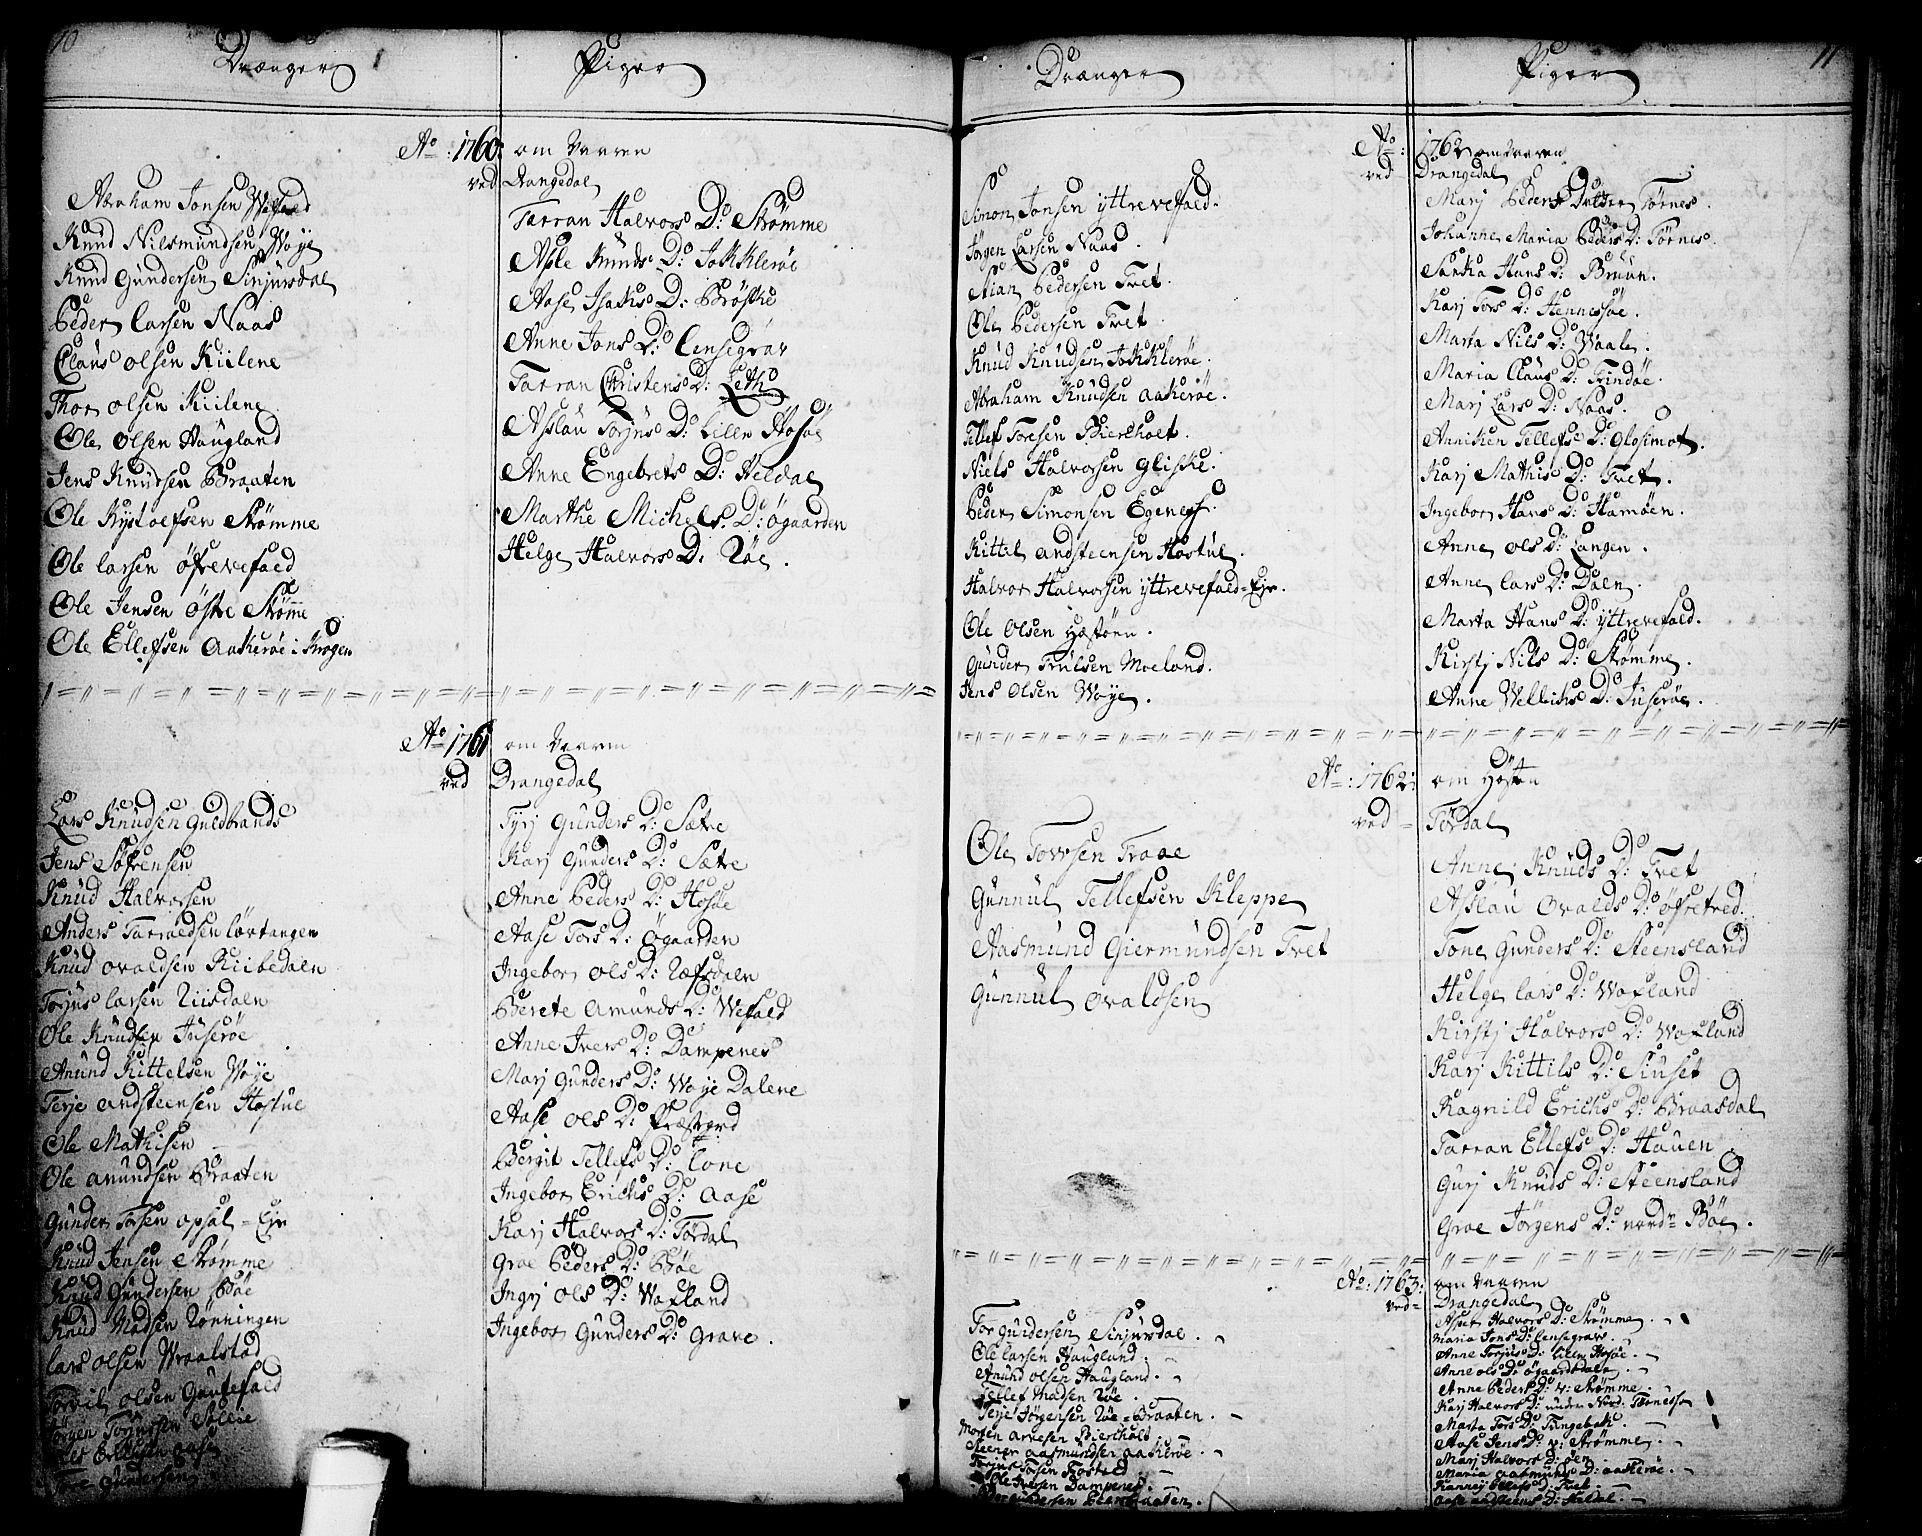 SAKO, Drangedal kirkebøker, F/Fa/L0001: Ministerialbok nr. 1, 1697-1767, s. 10-11